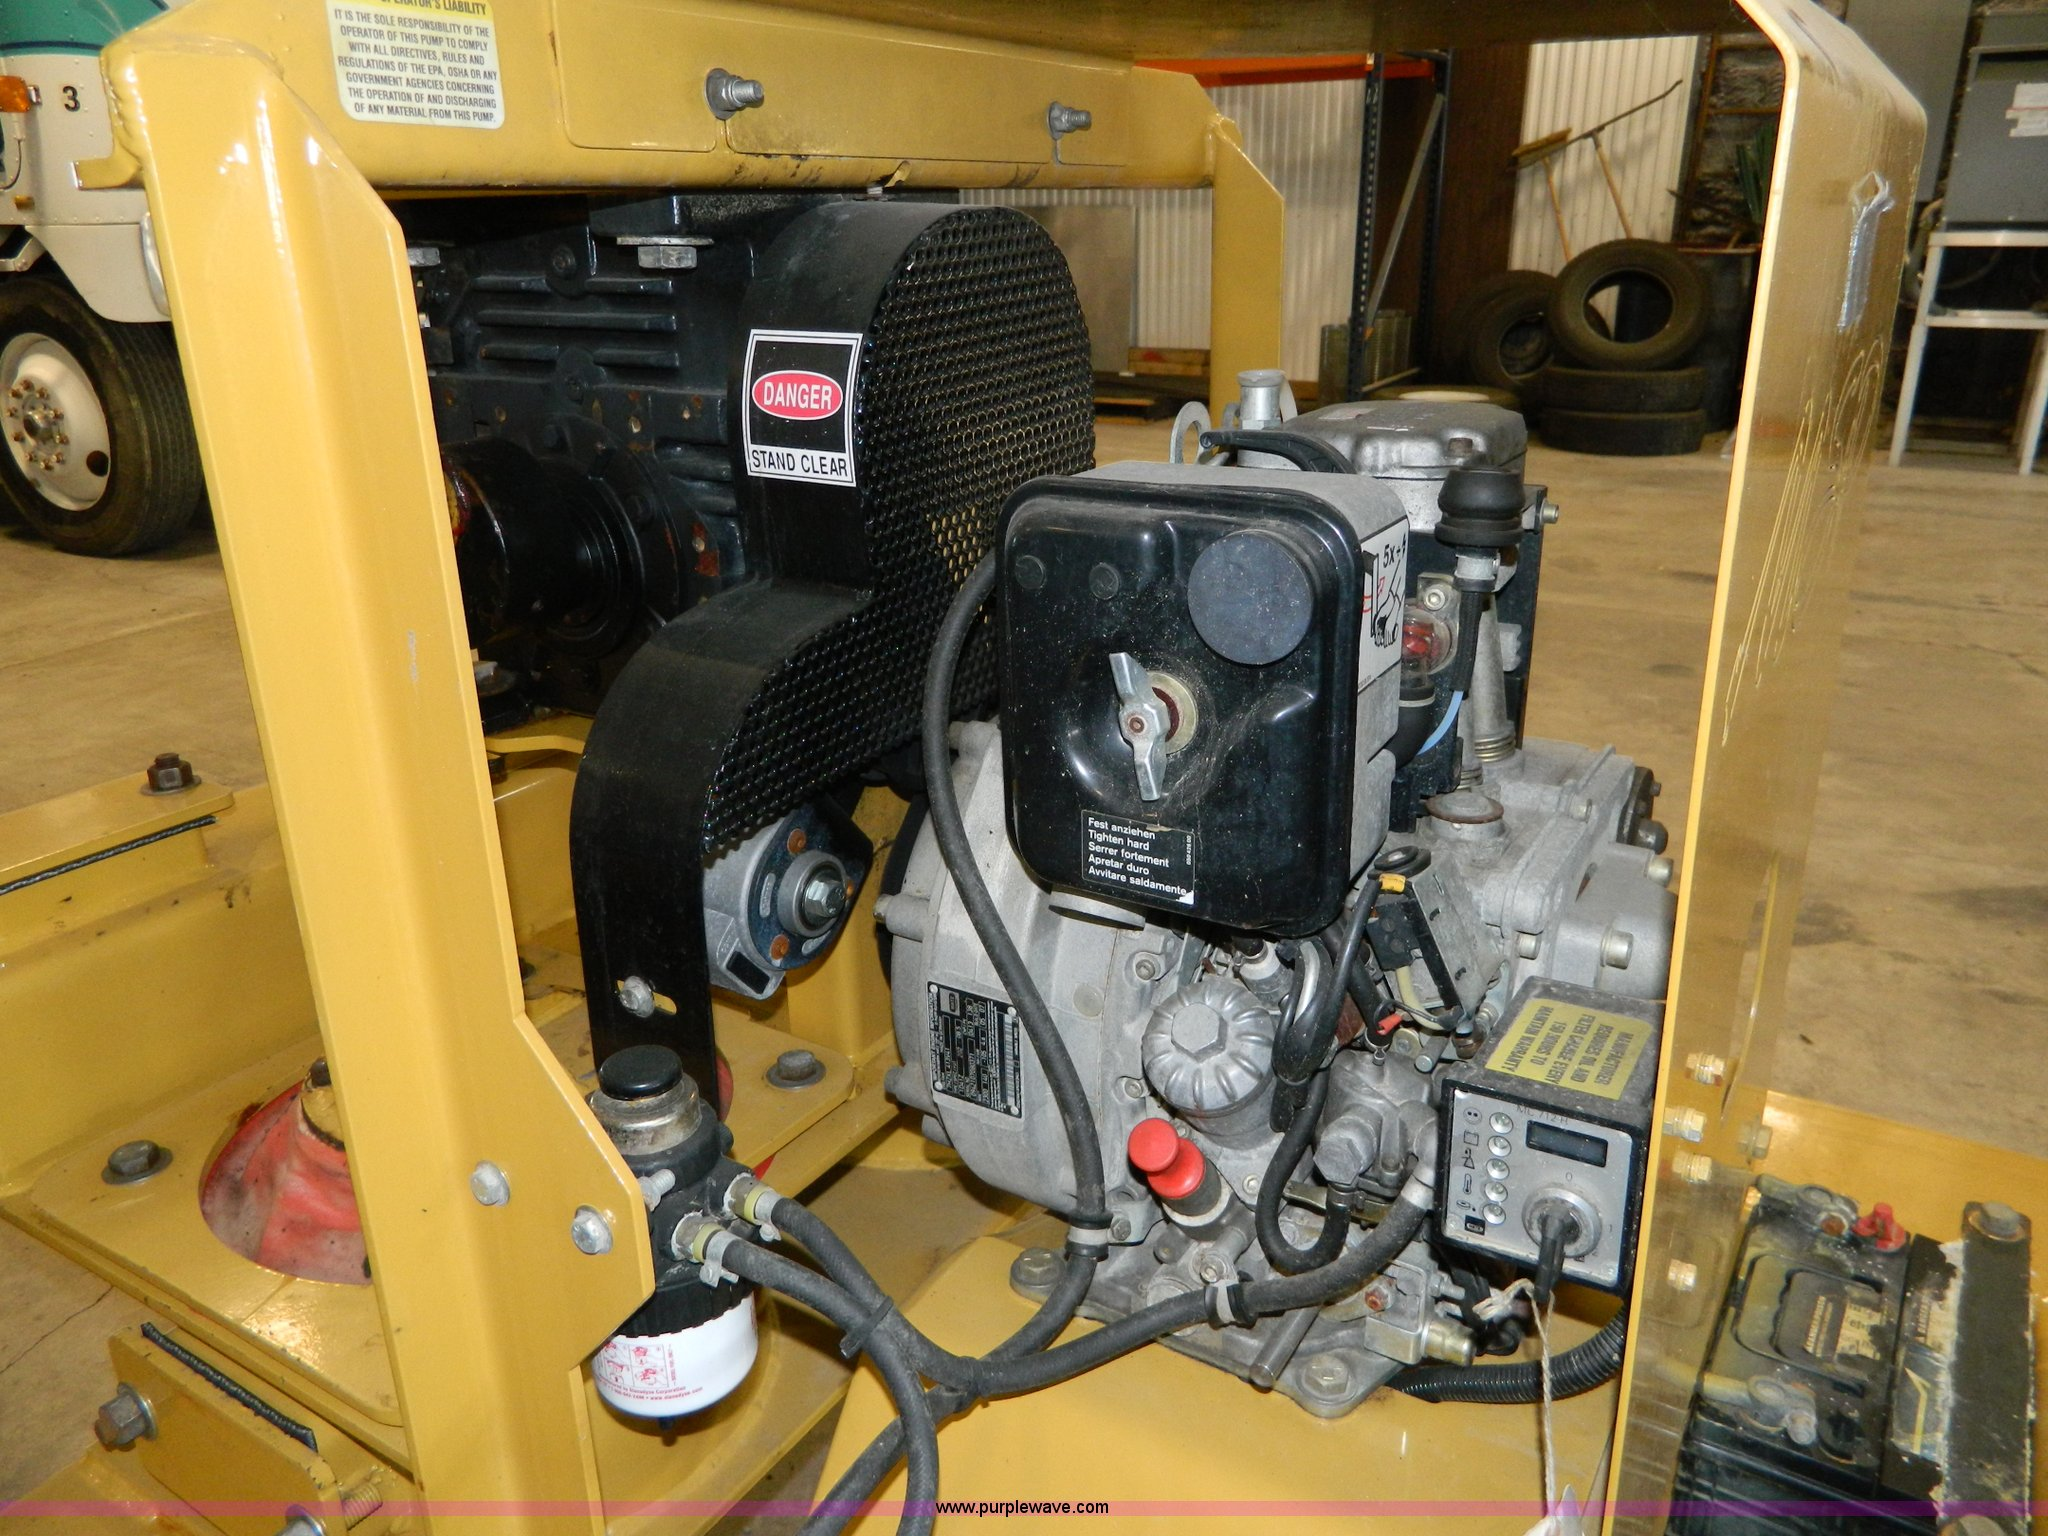 Myers Seth Dd 4 Ha T Double Diaphragm Pump Item Az Exterior Wiring Regulations Full Size In New Window